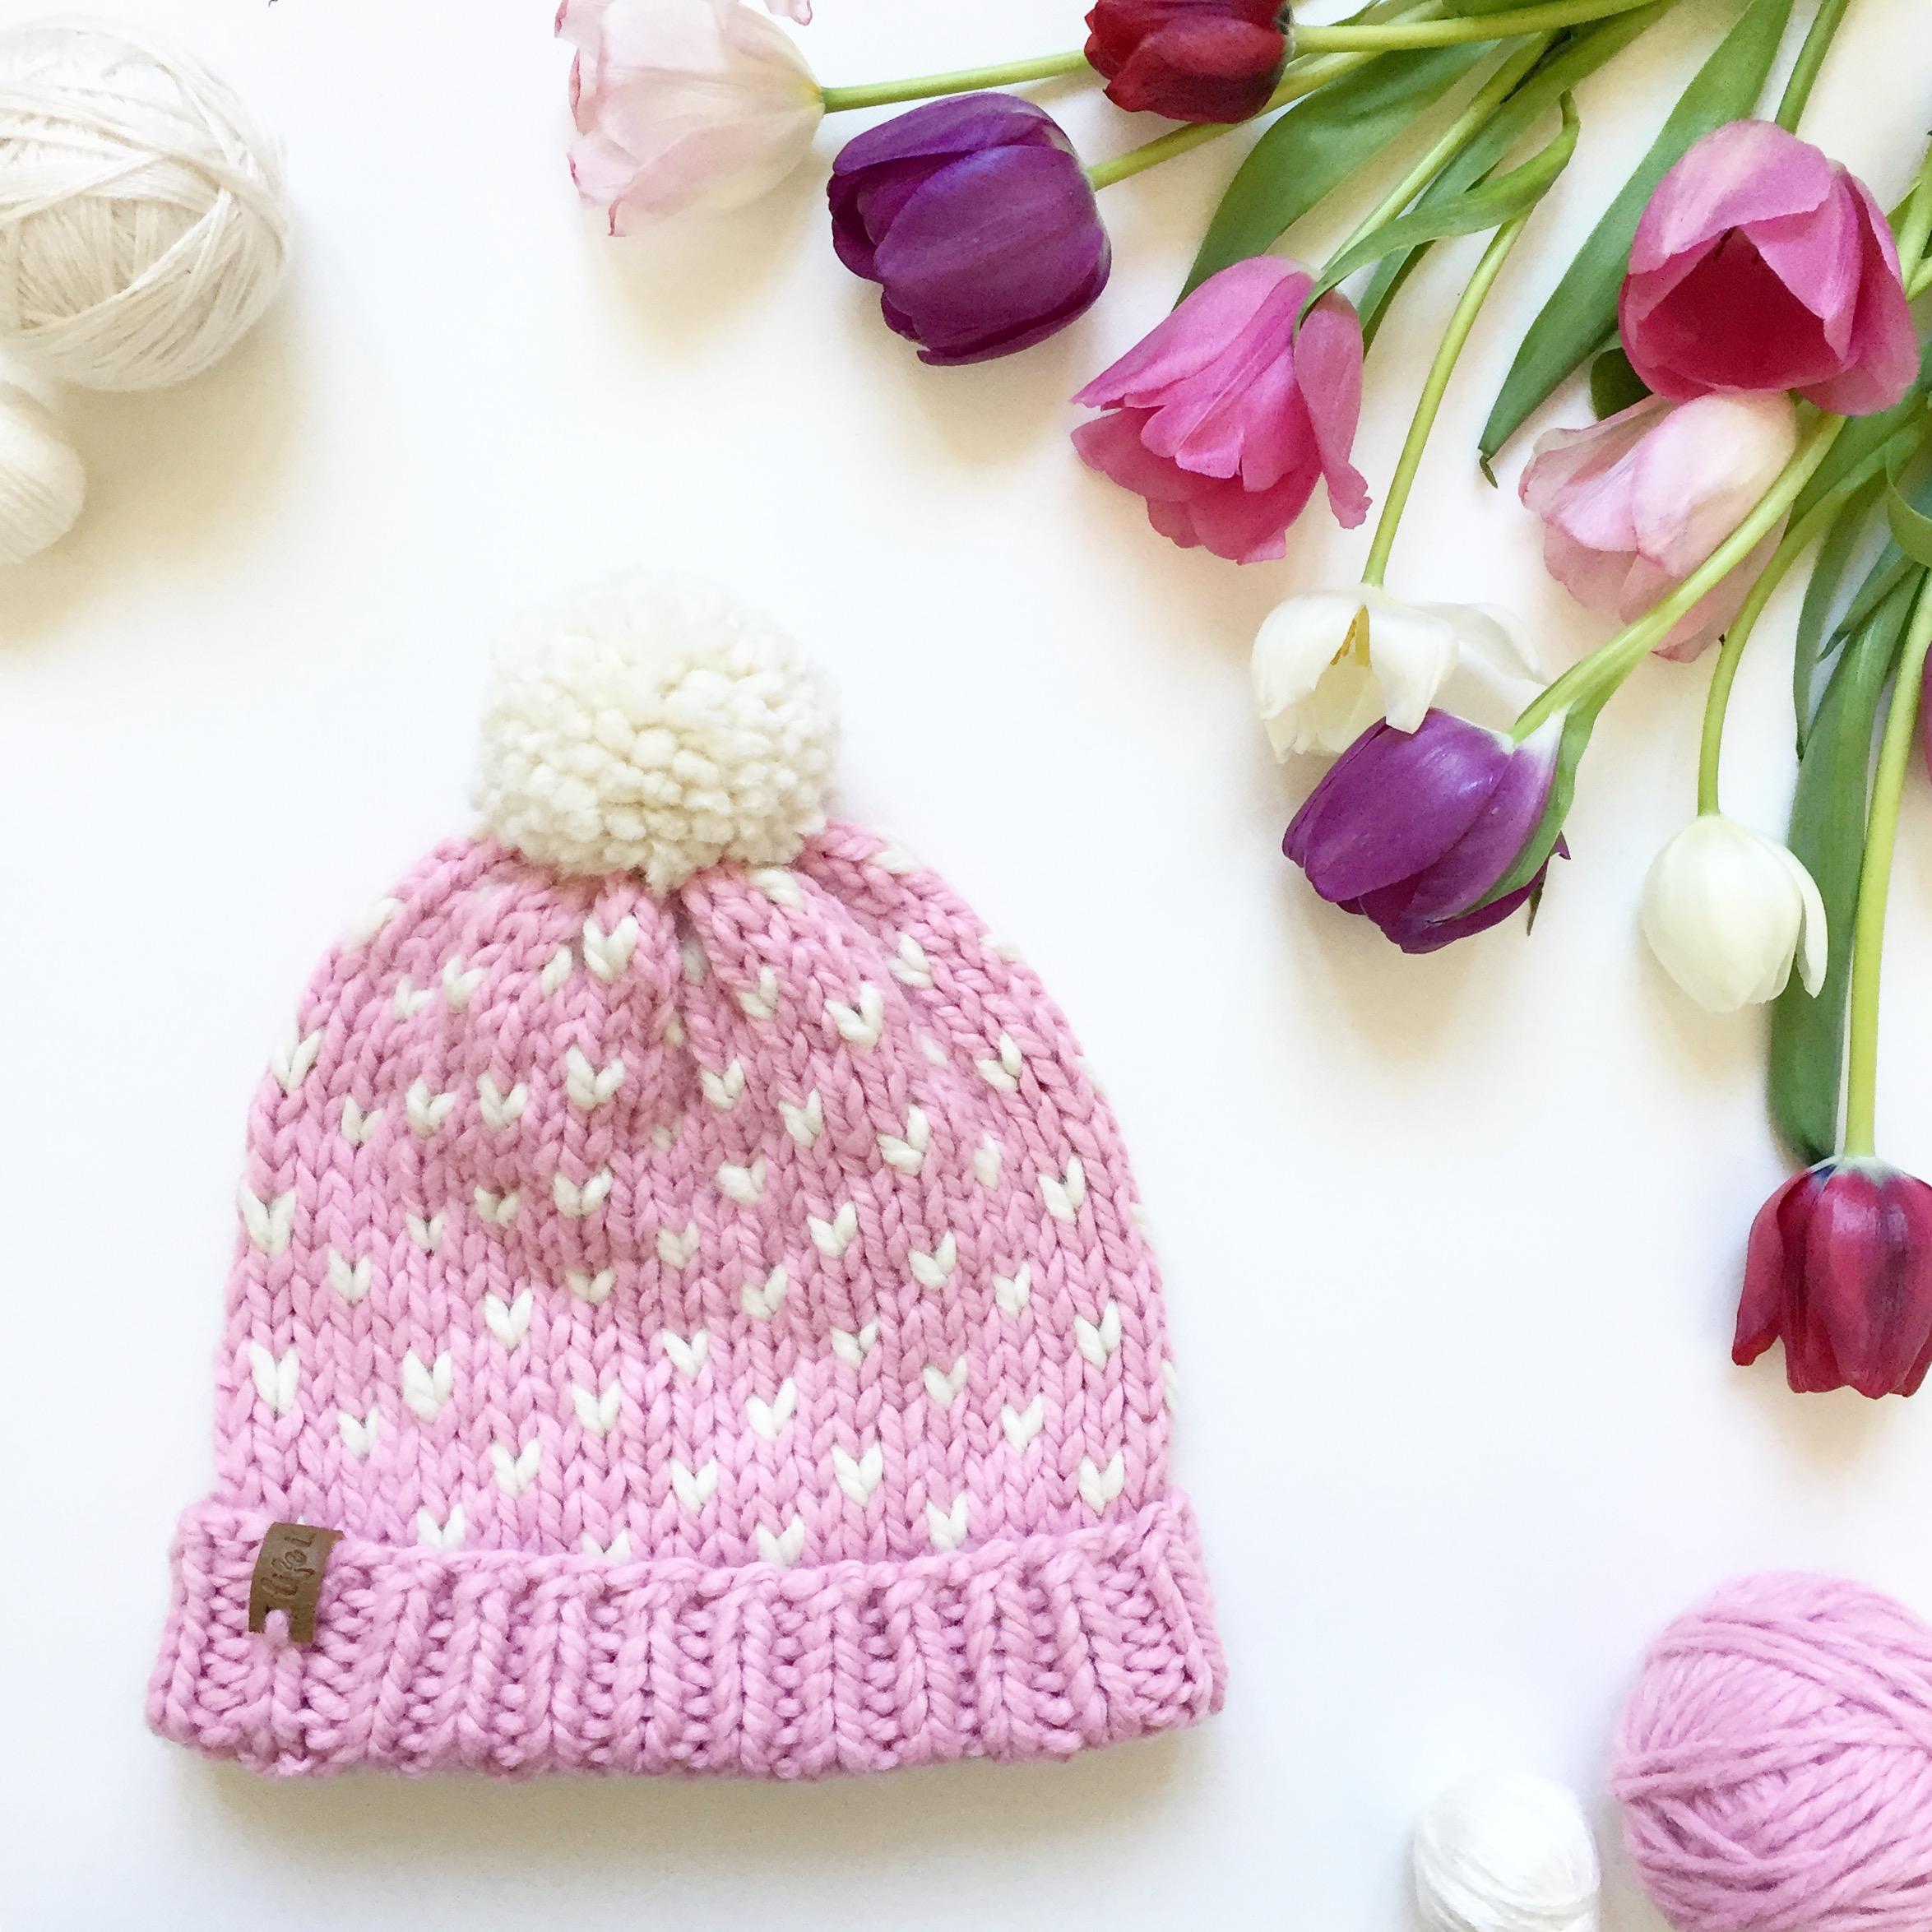 basic-fair-isle-hat-tulips